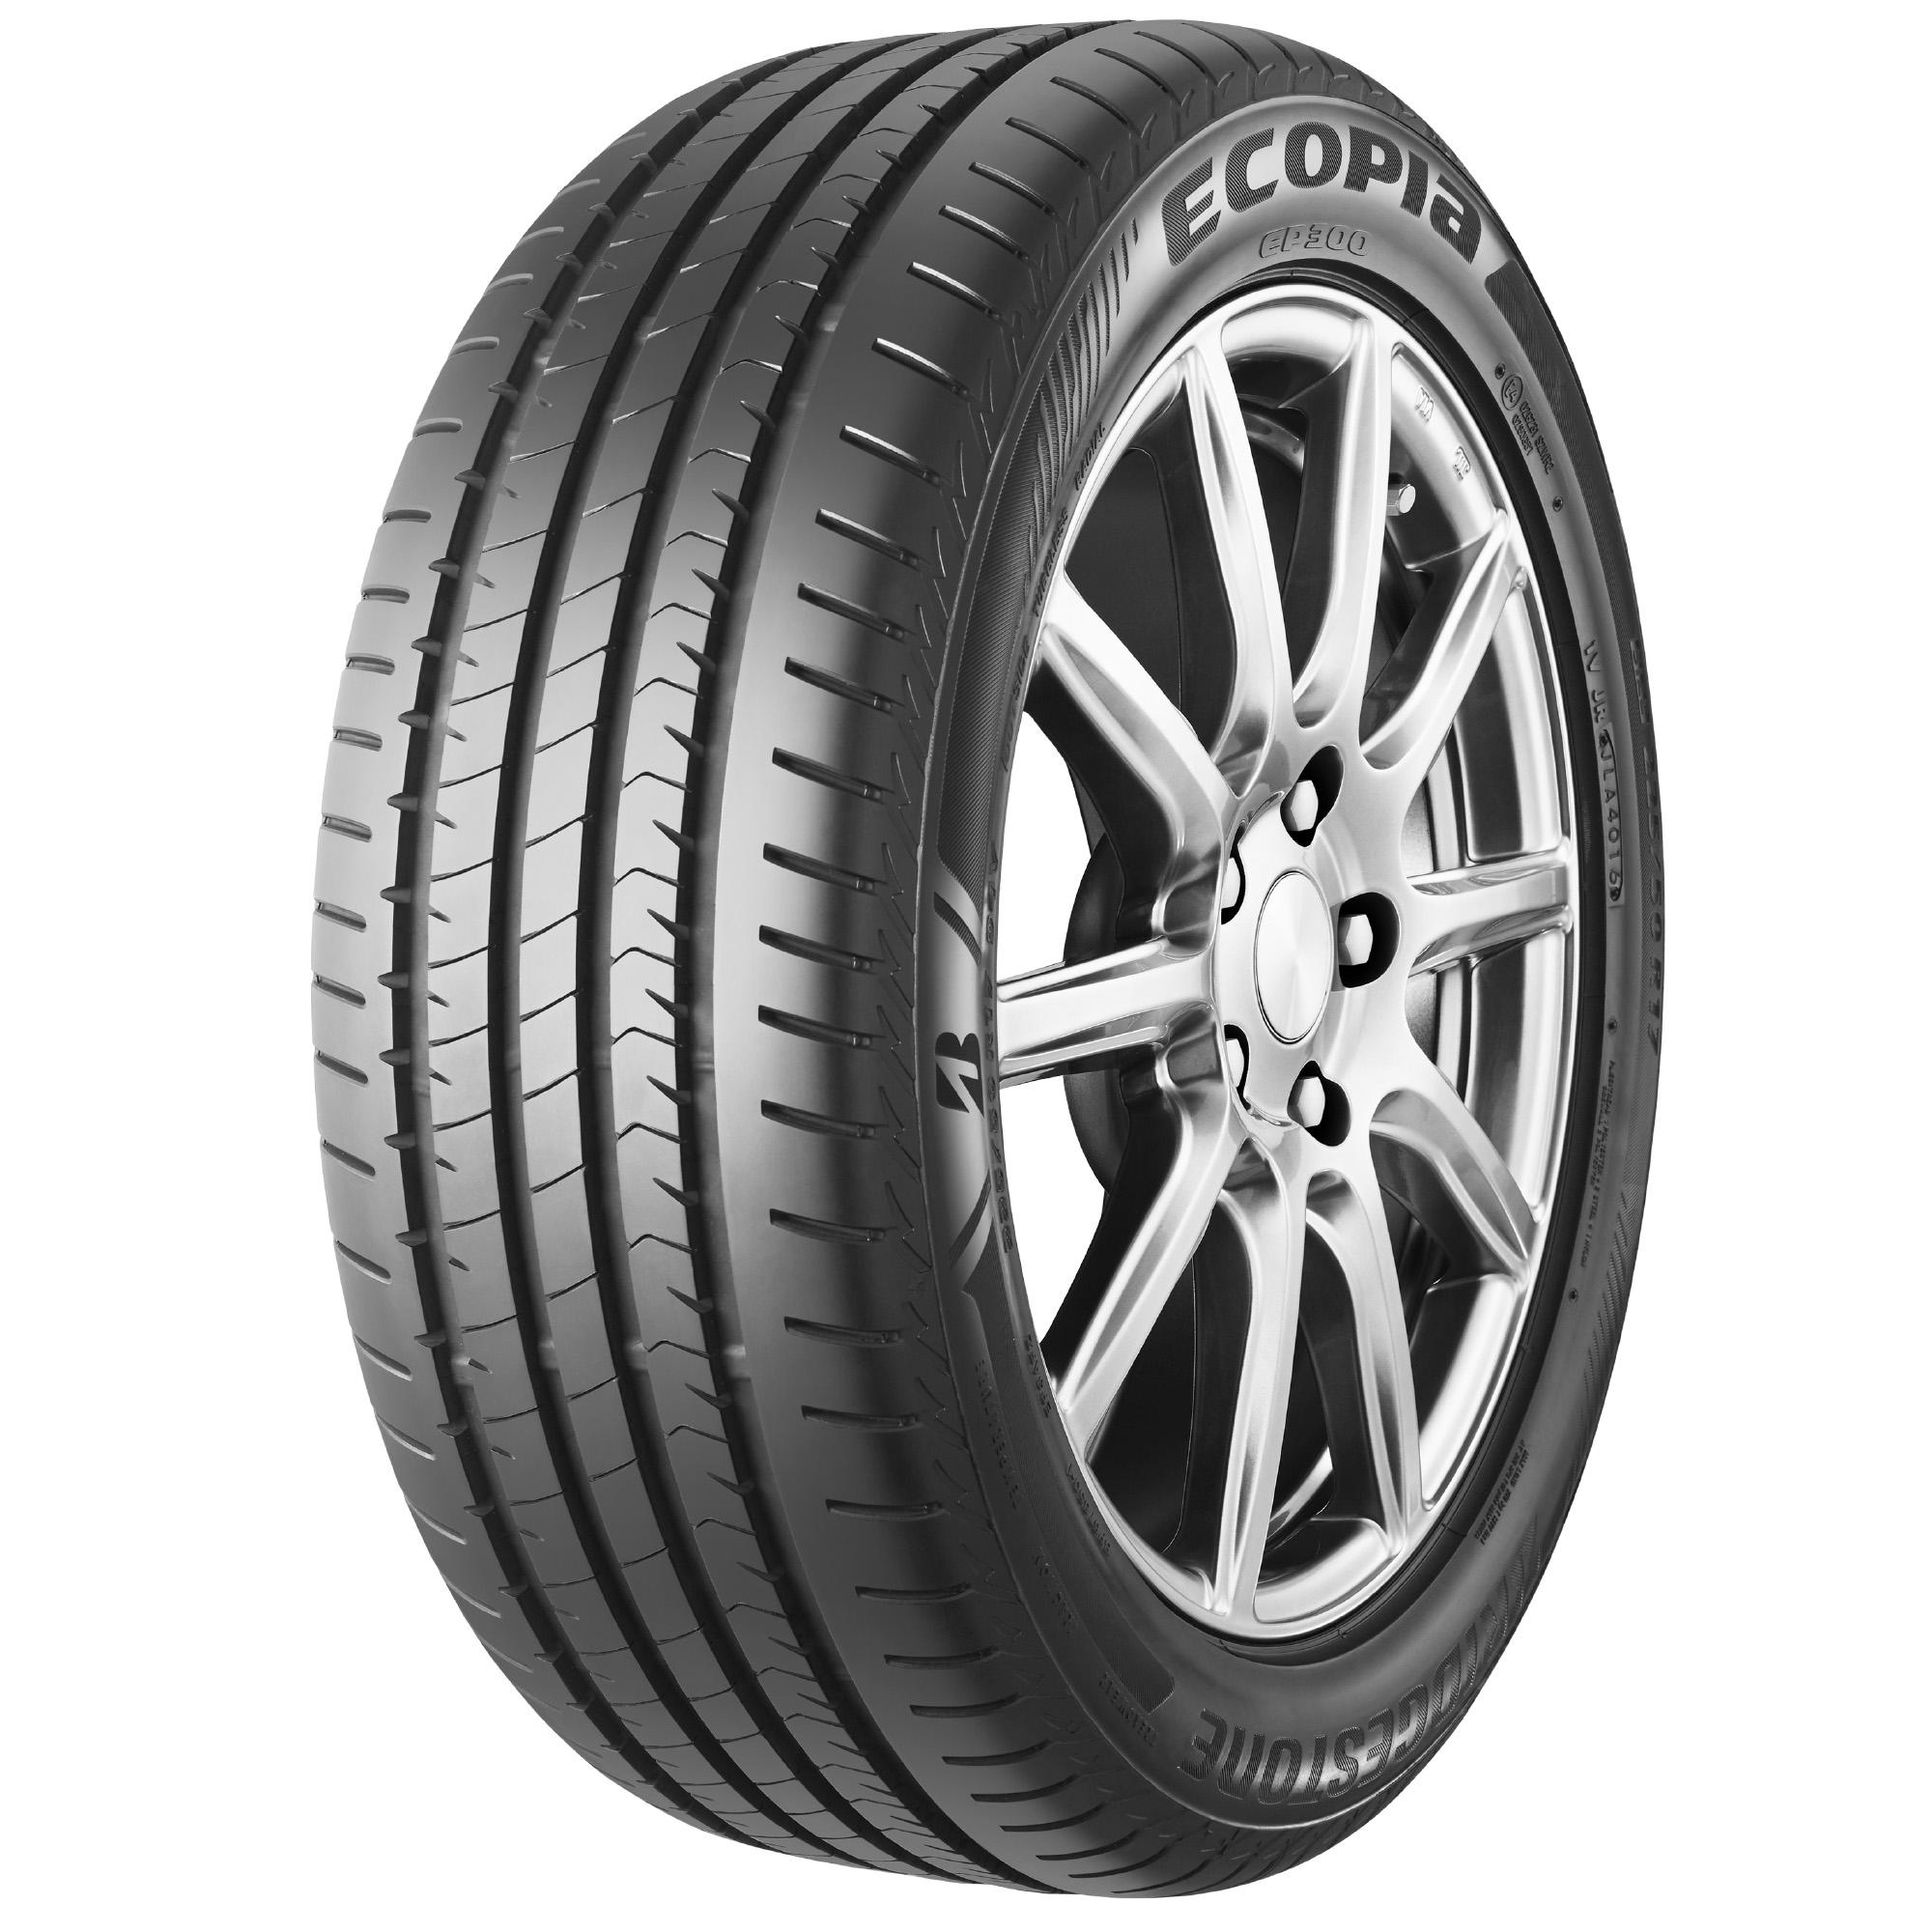 Walmart Stock Phone Number >> Ecopia EP300 | Fuel Saving Tyre | More Mileage ...